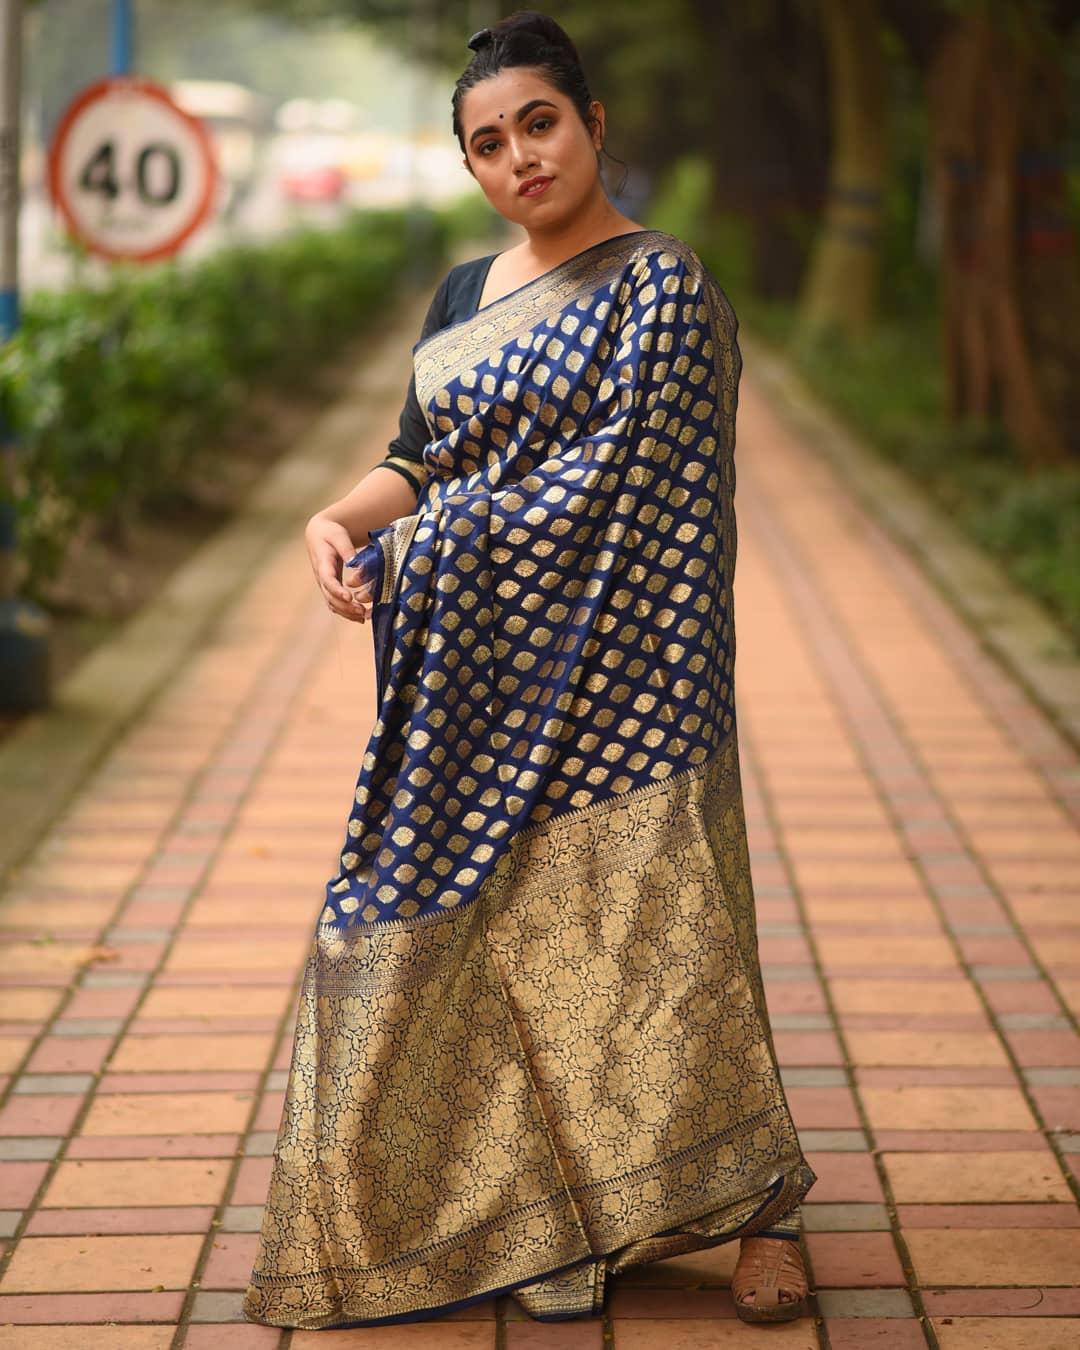 instagram-fashion-blogger-india (7)